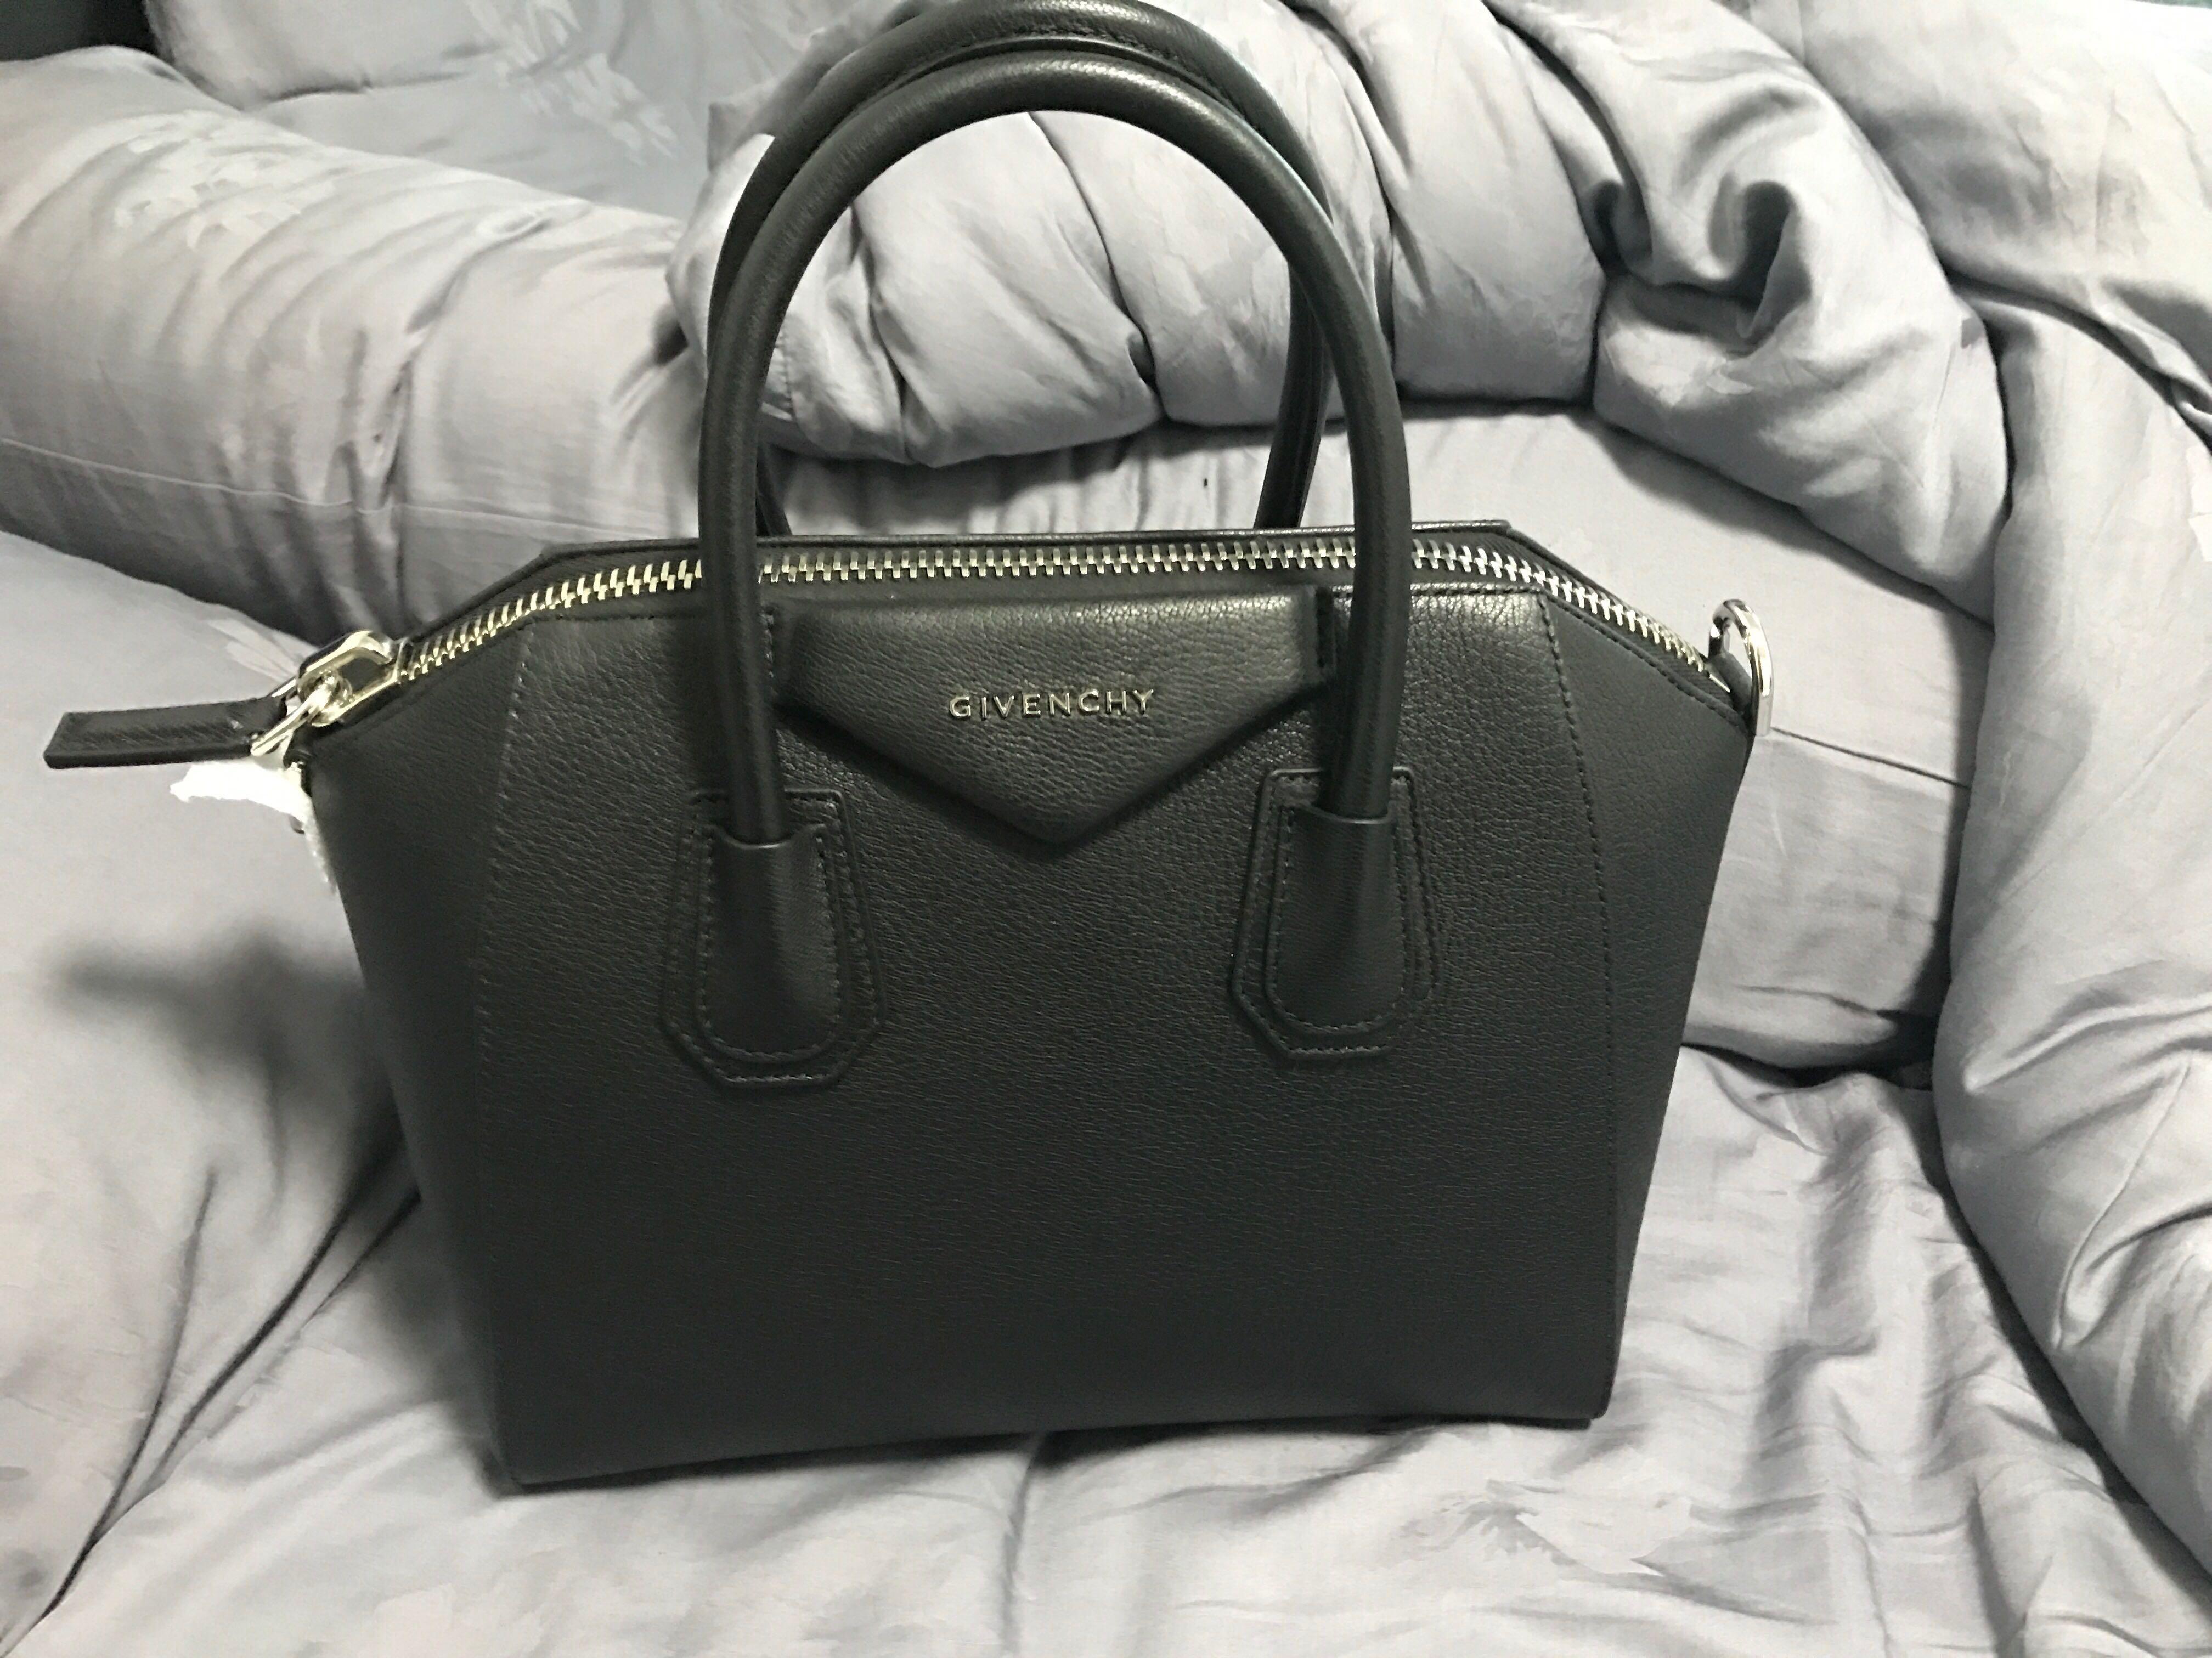 79f460cbe21 Brand New Givenchy Antigona Small Noir, Women's Fashion, Bags ...